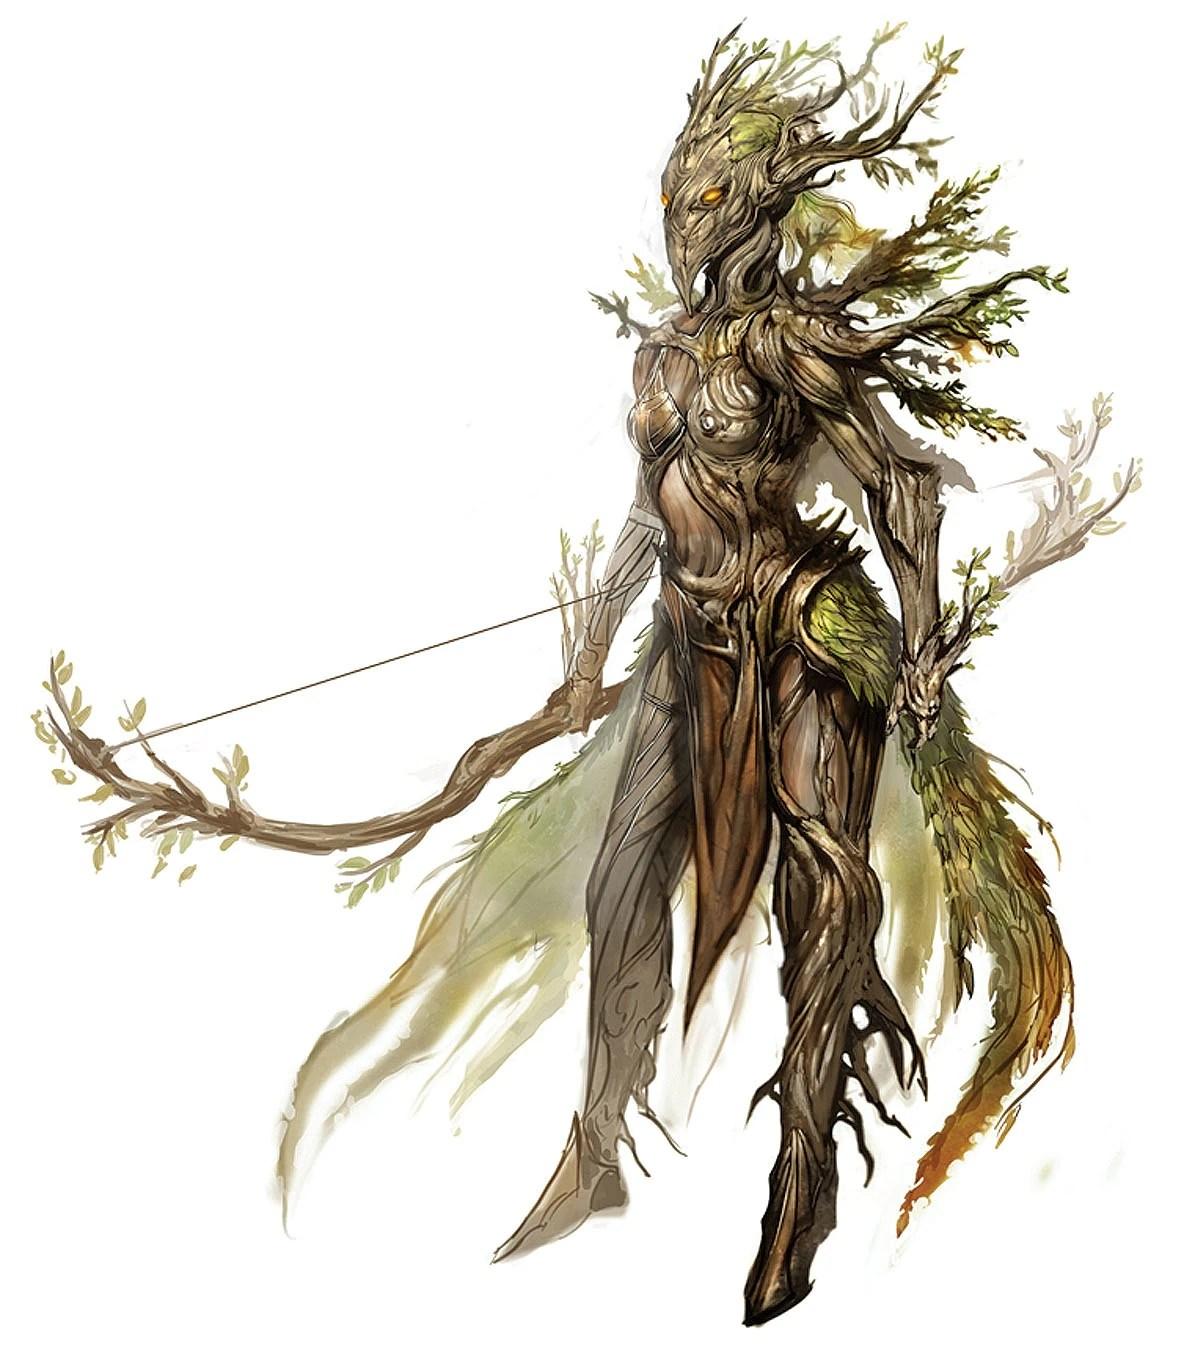 Guild Wars 2 Character Concept Art